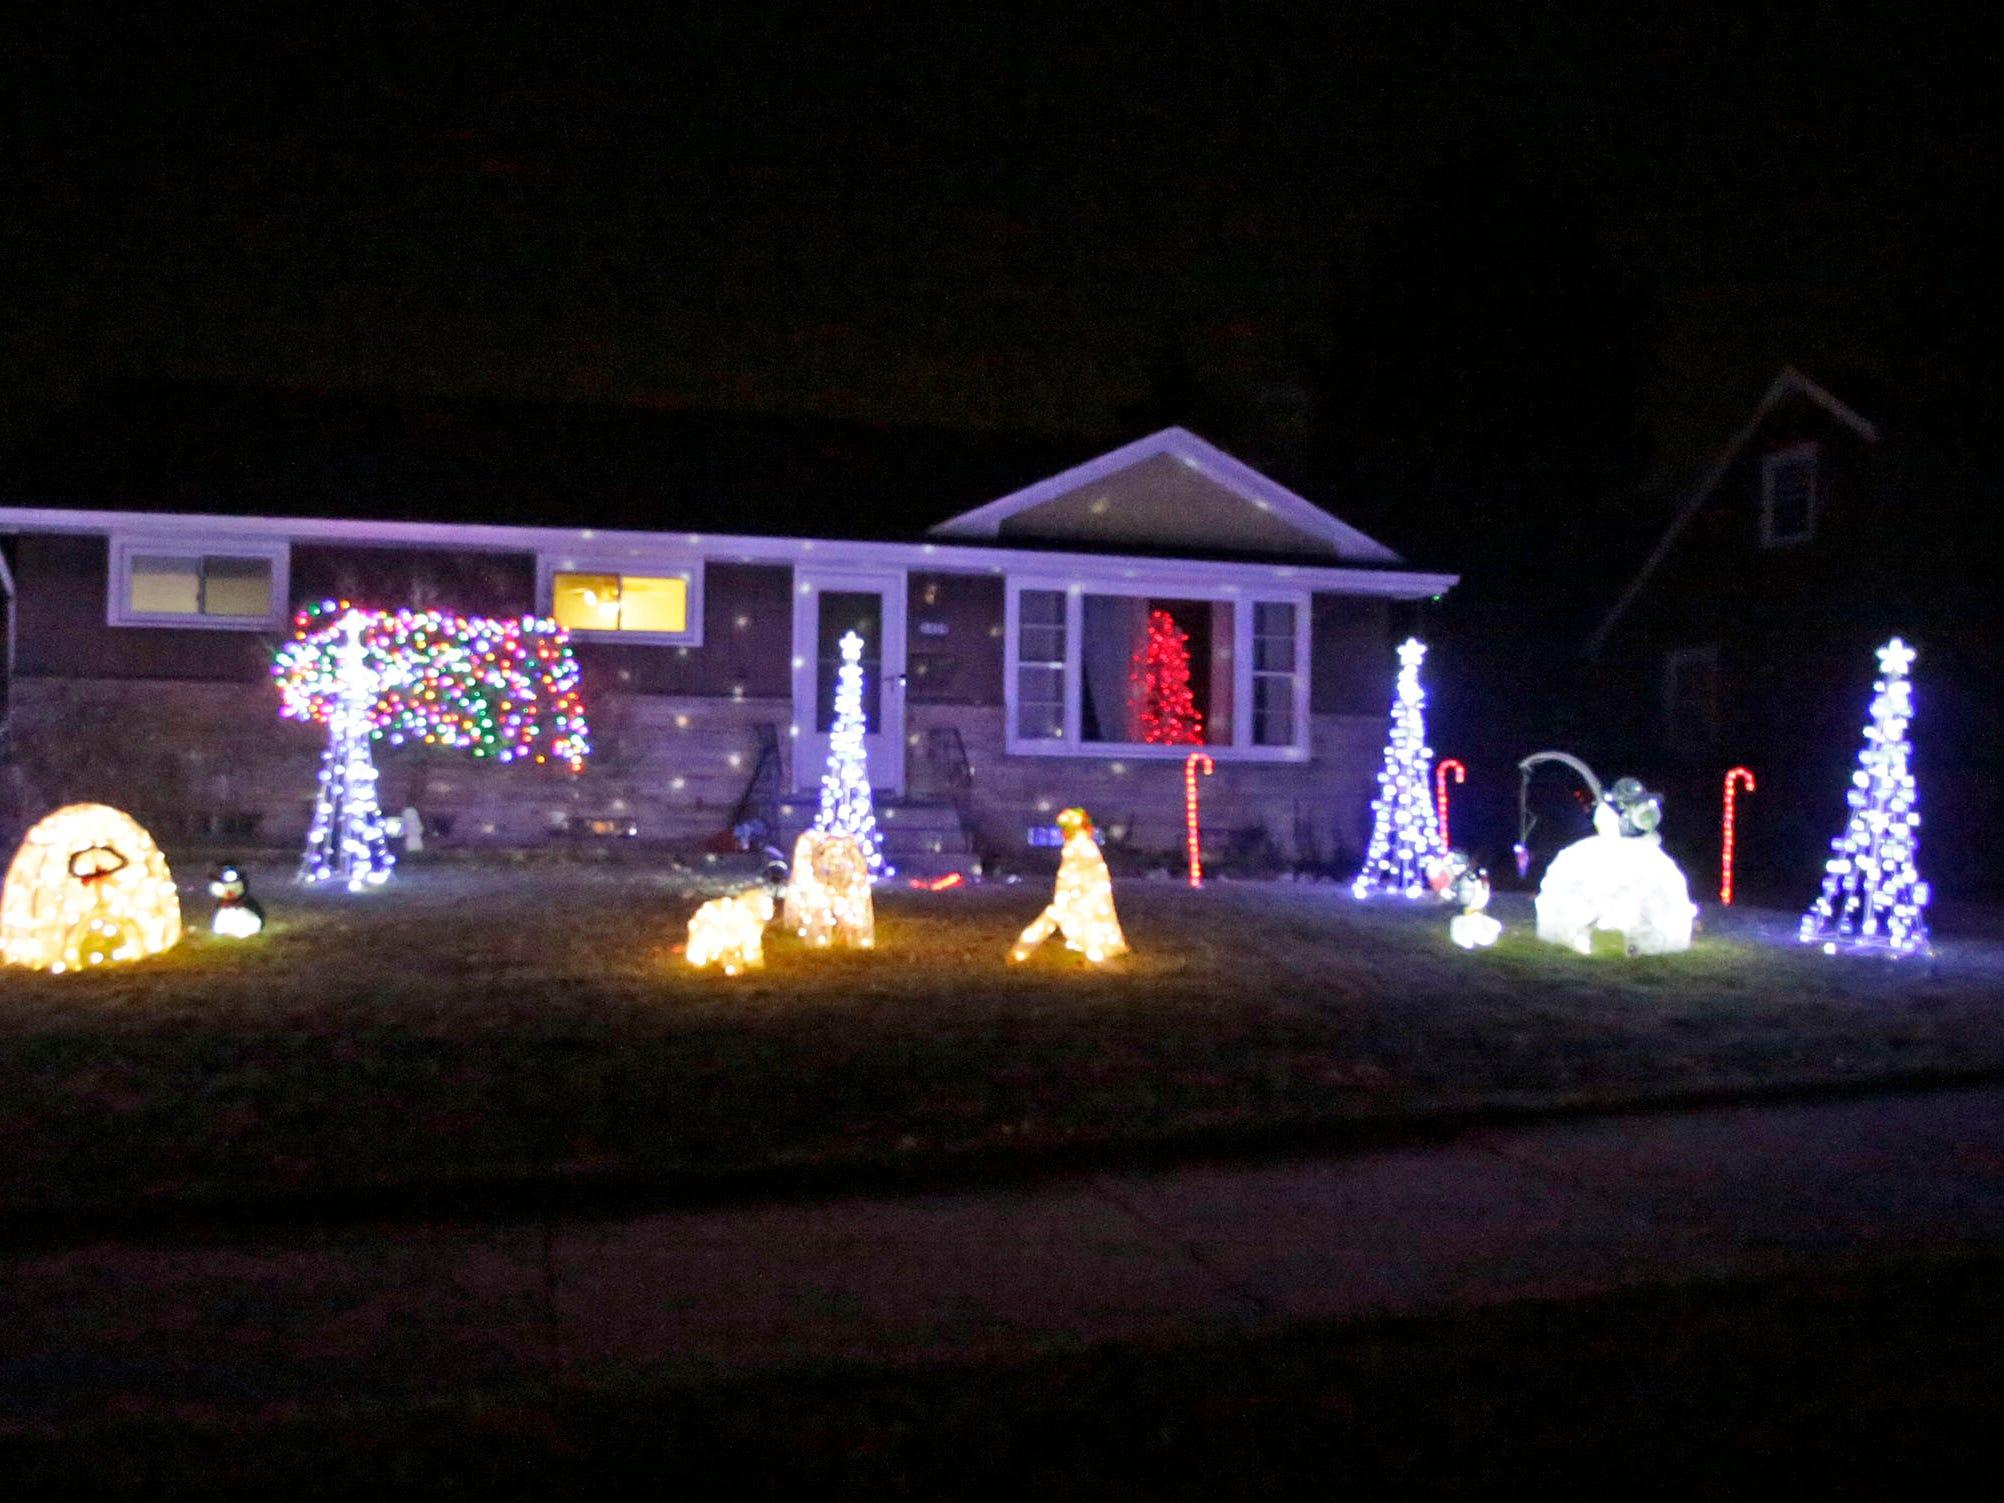 A Christmas display near Evans Avenue, Saturday, December 15, 2108, in Sheboygan, Wis.